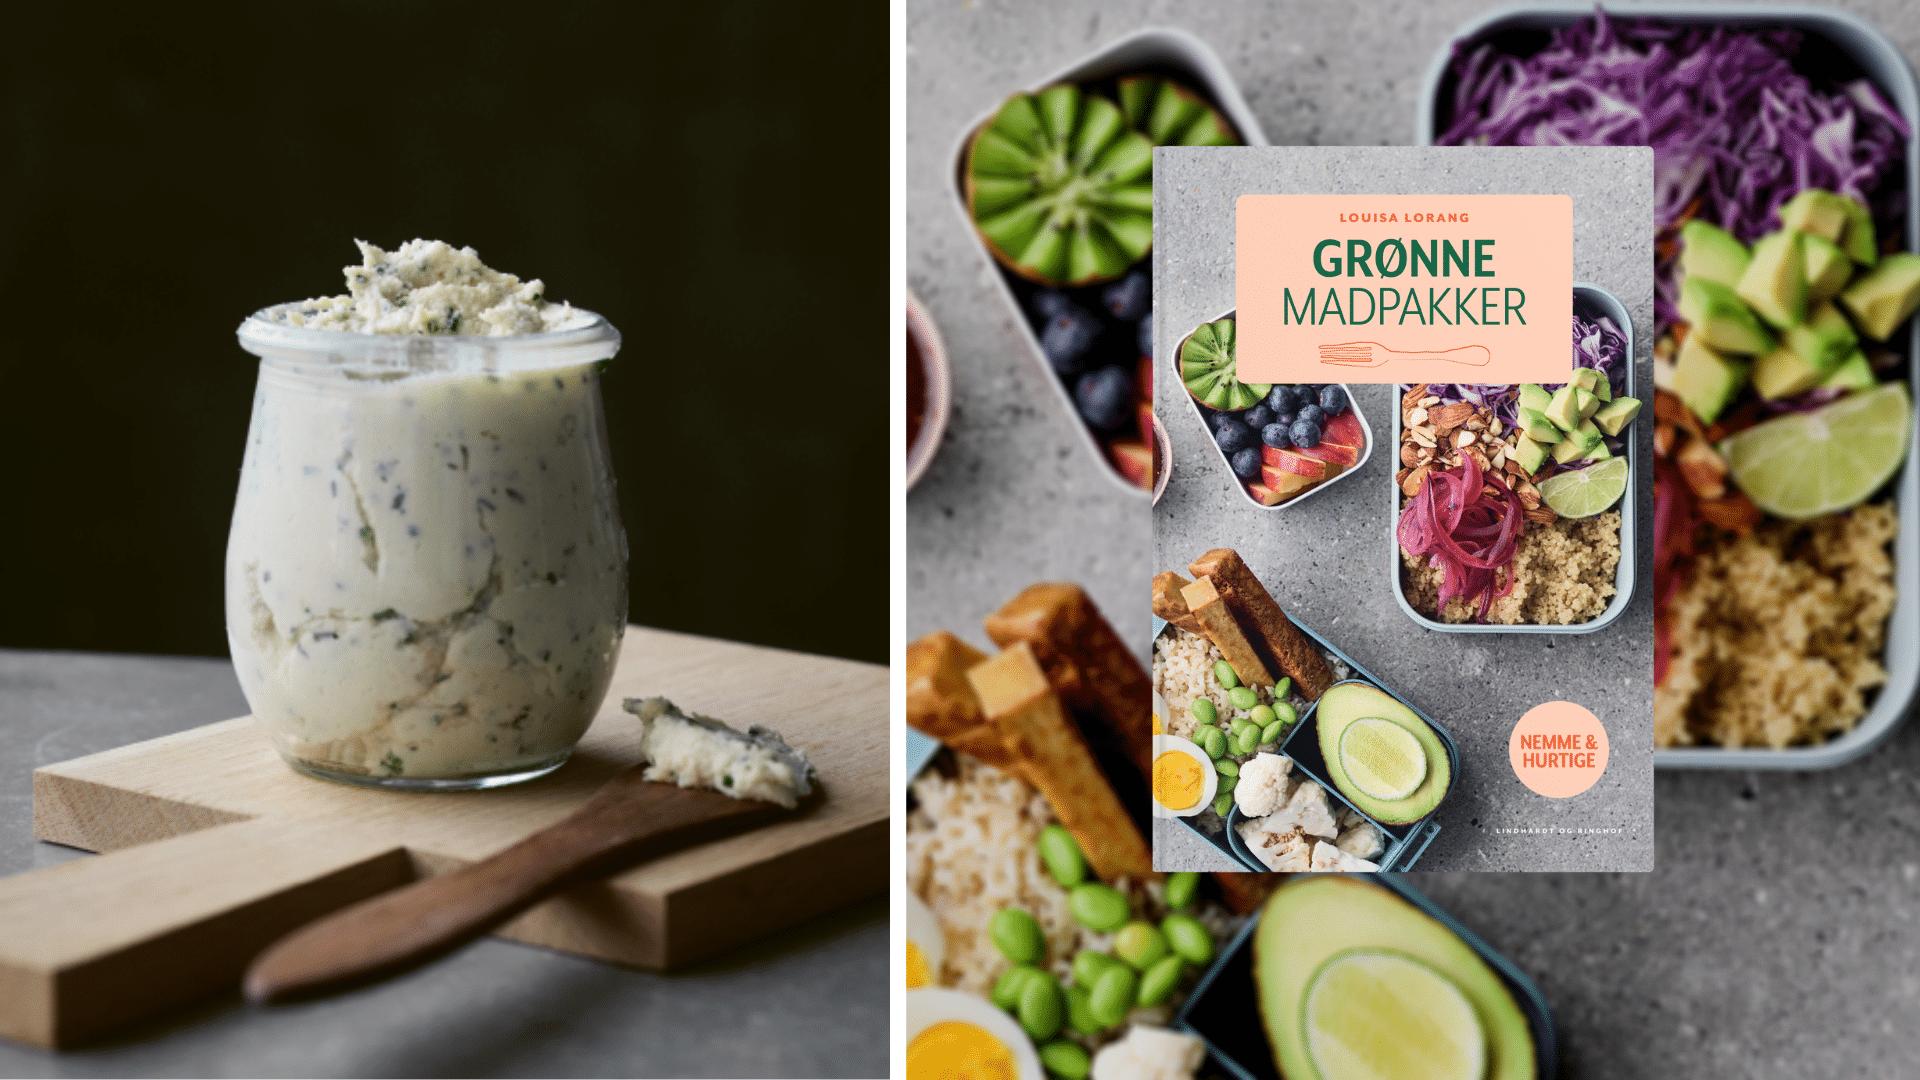 Grønne madpakker, Louisa Lorang, Wannabe-Smøreost